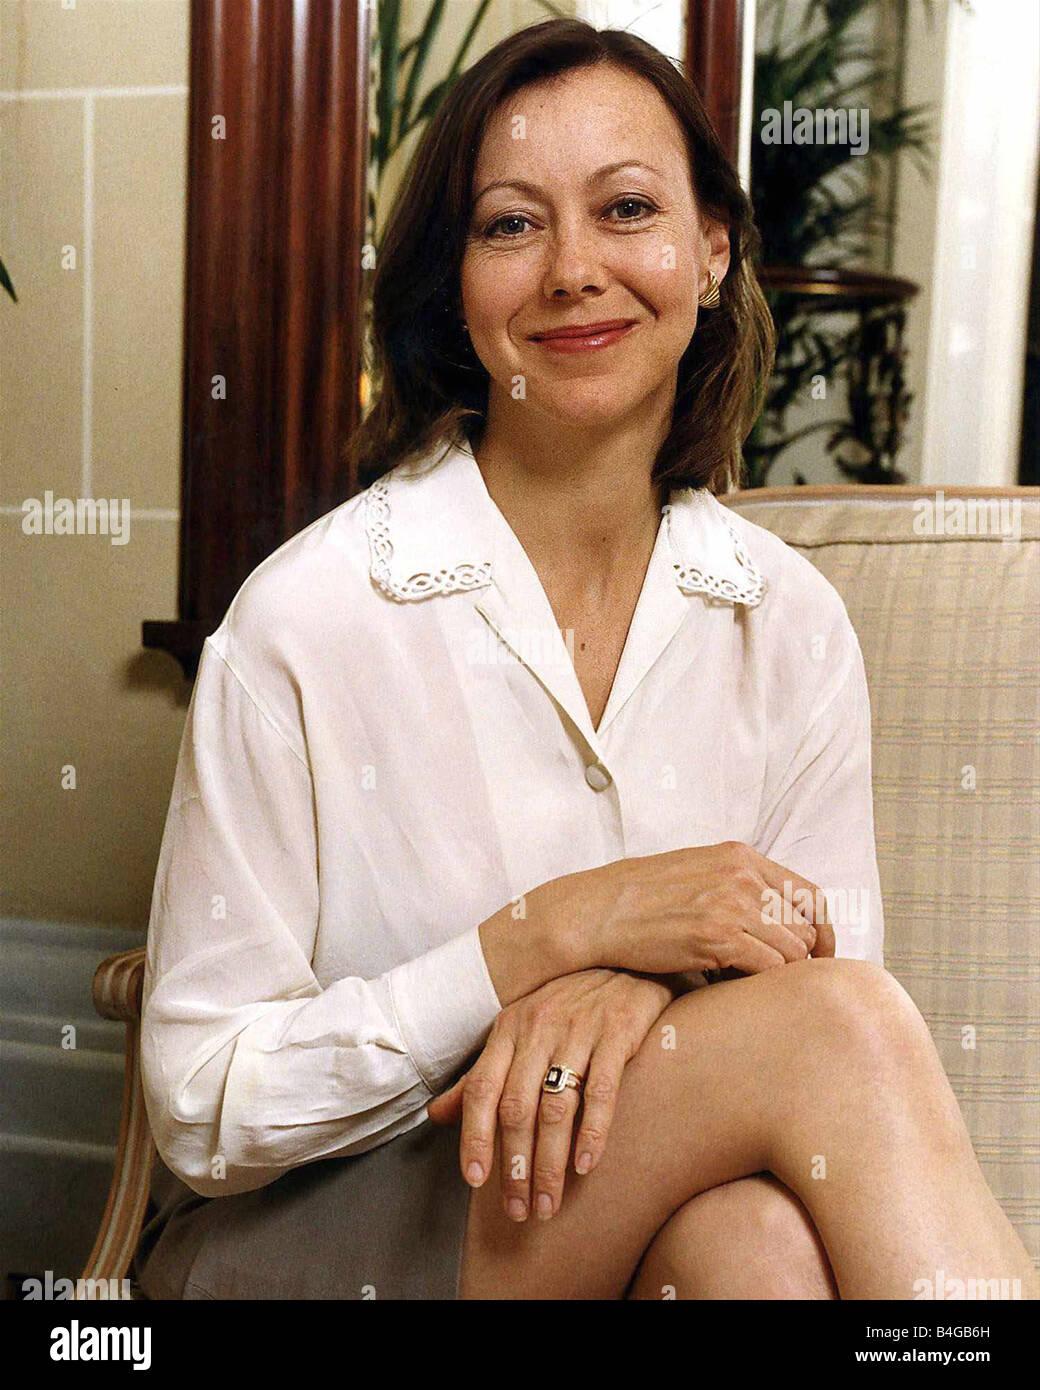 Nanette Medved (b. 1971) Hot video Katherine Connella,Laurice Guillen (b. 1947)